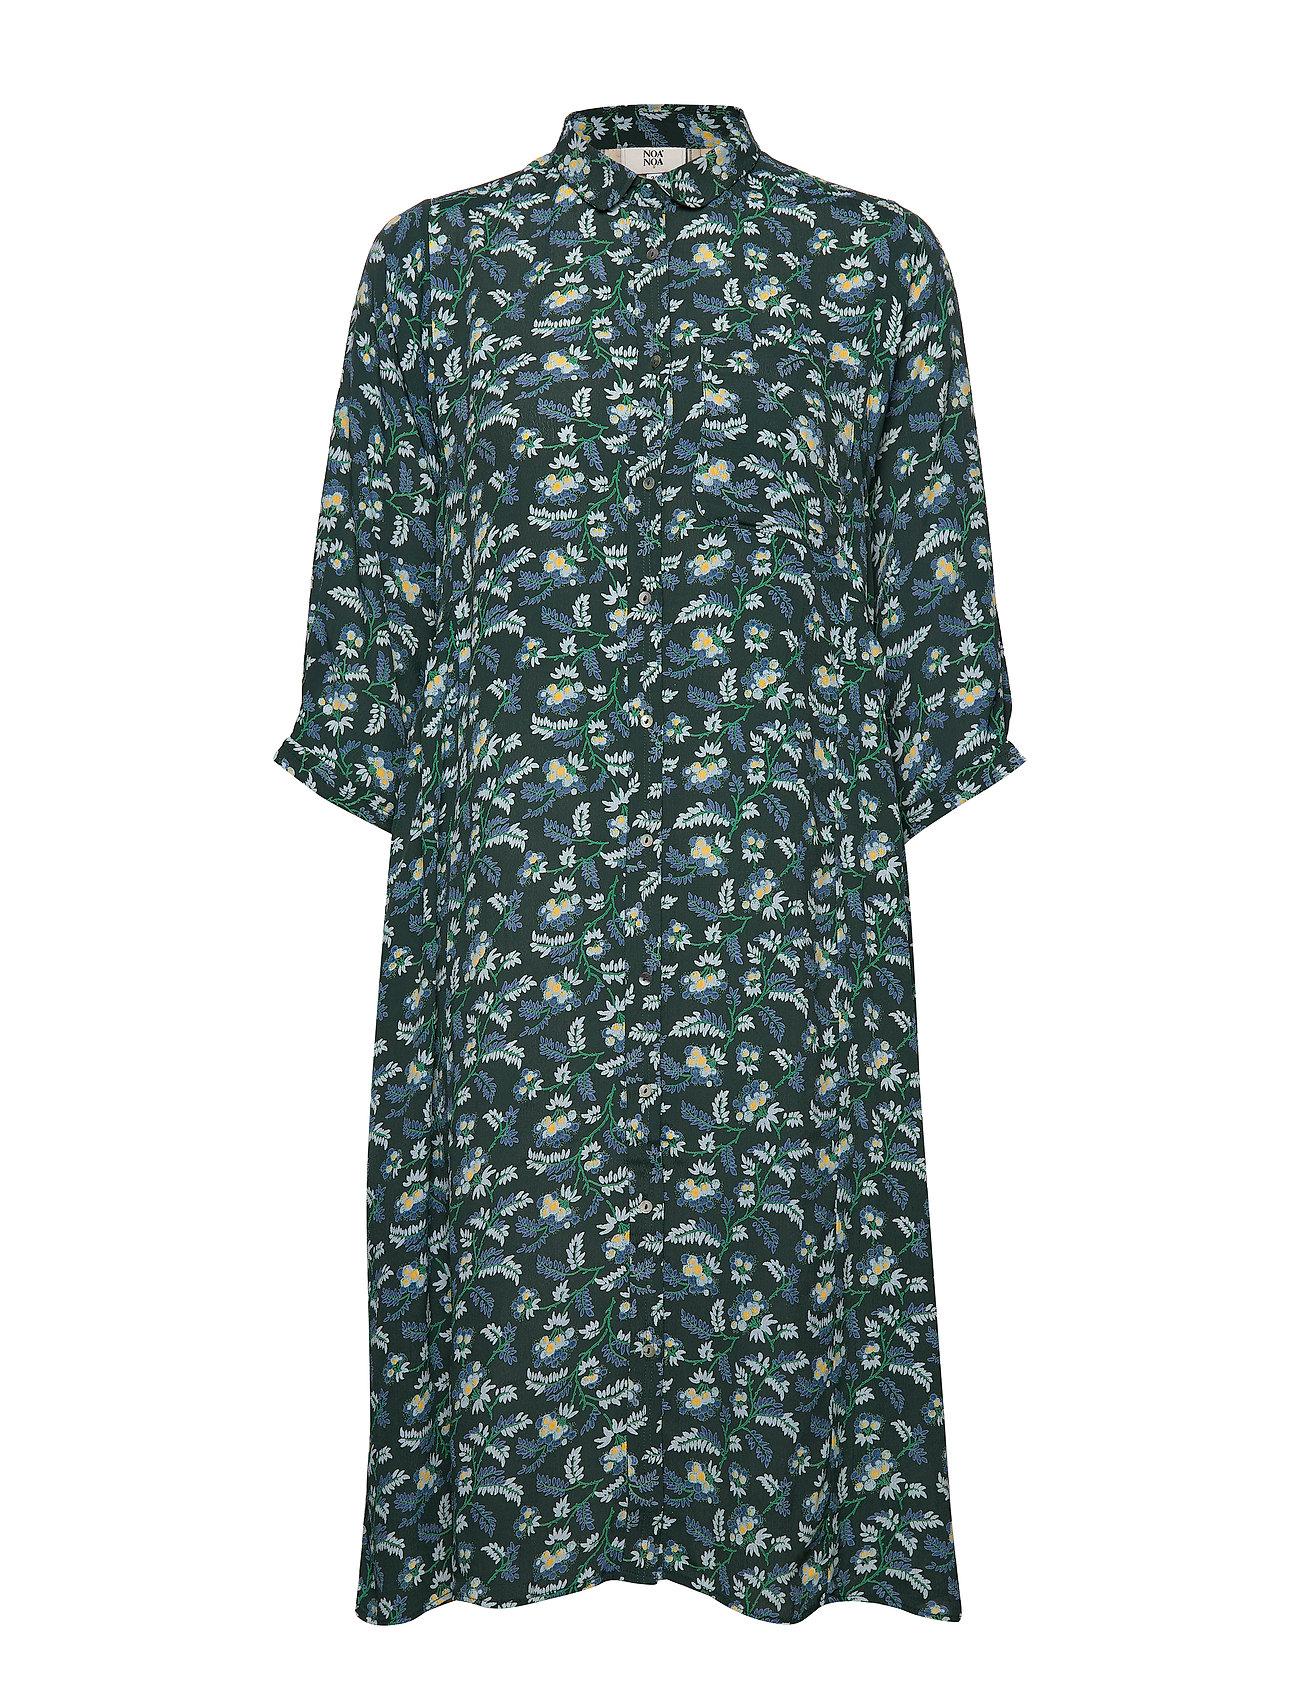 Noa Noa Dress short sleeve - PRINT GREEN